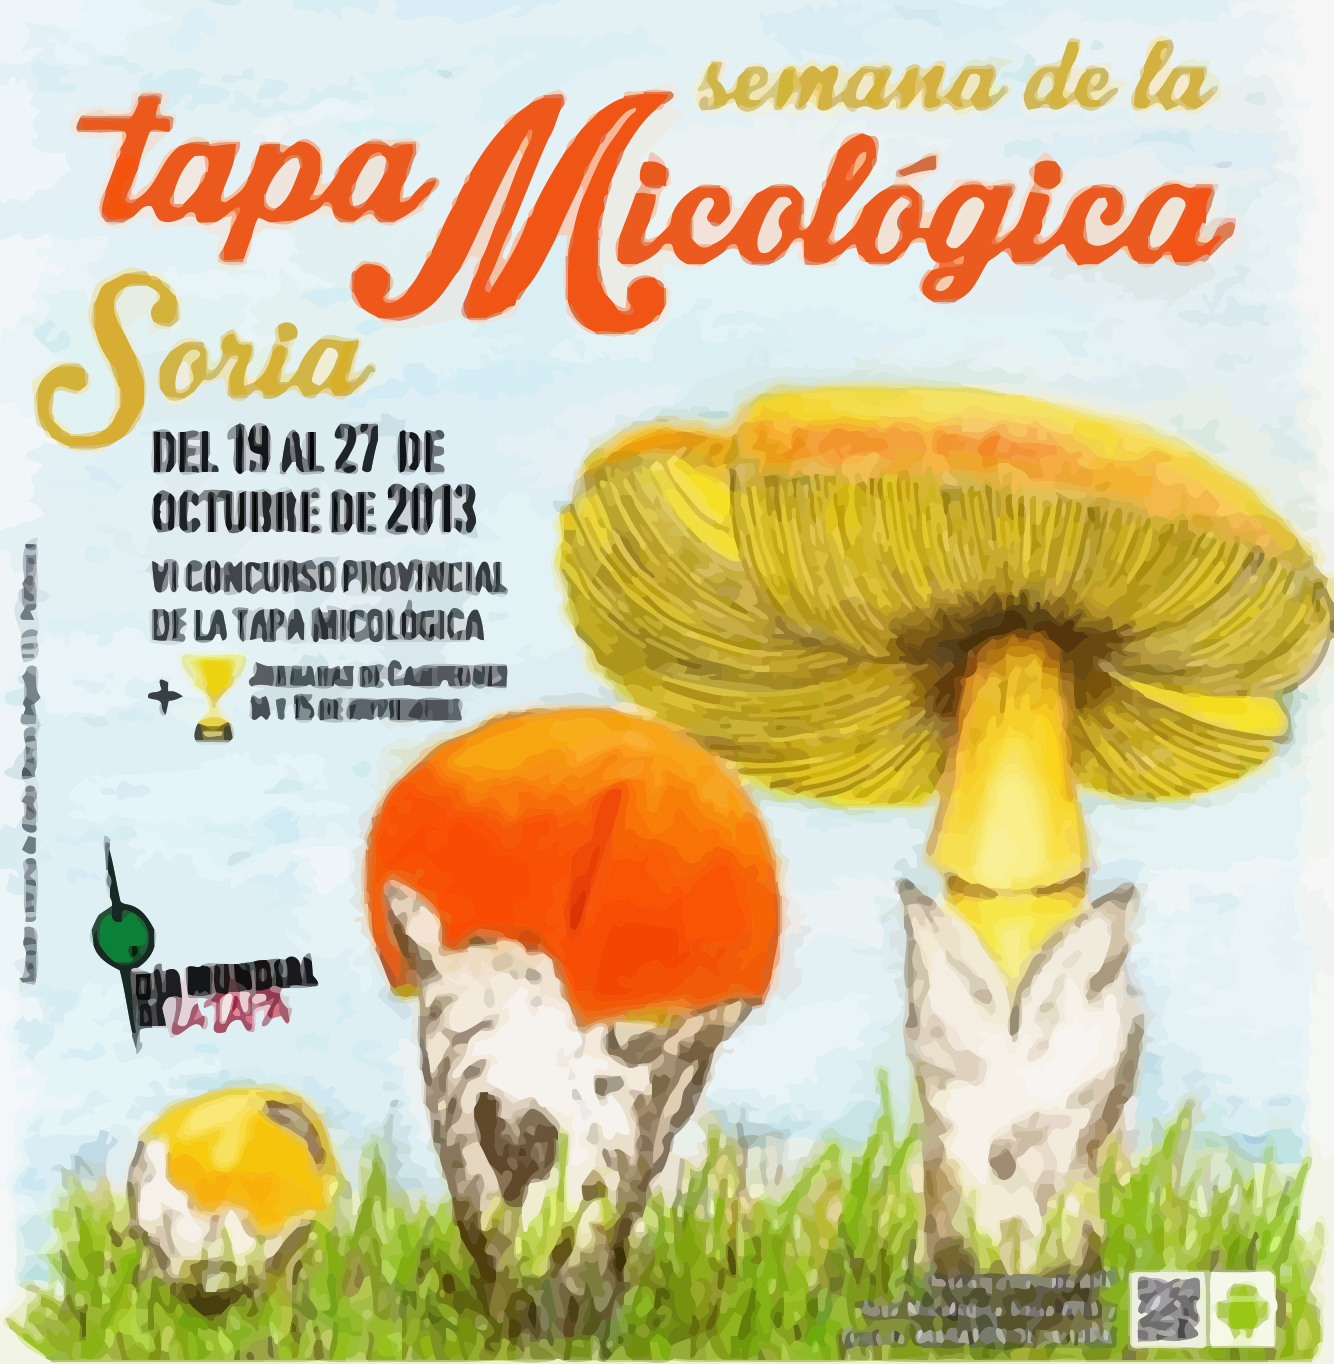 artel de la Semana de la Tapa Micológica de Soria 2013